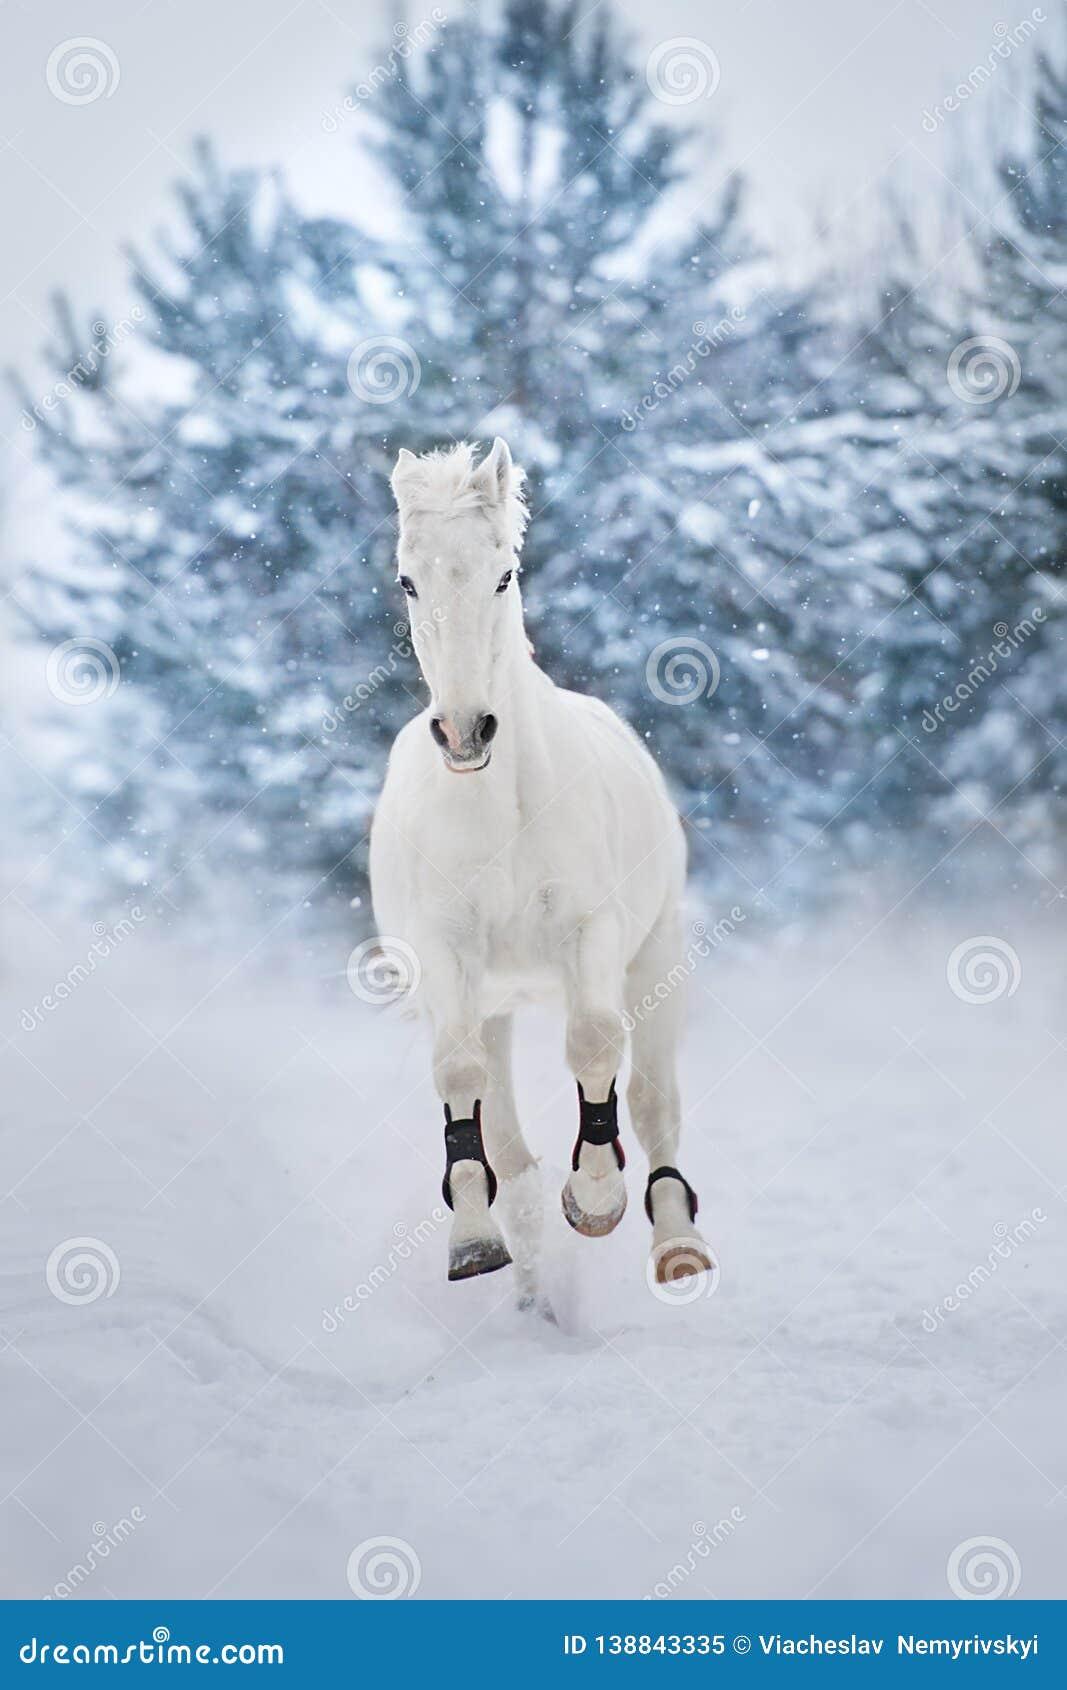 horse run in snow